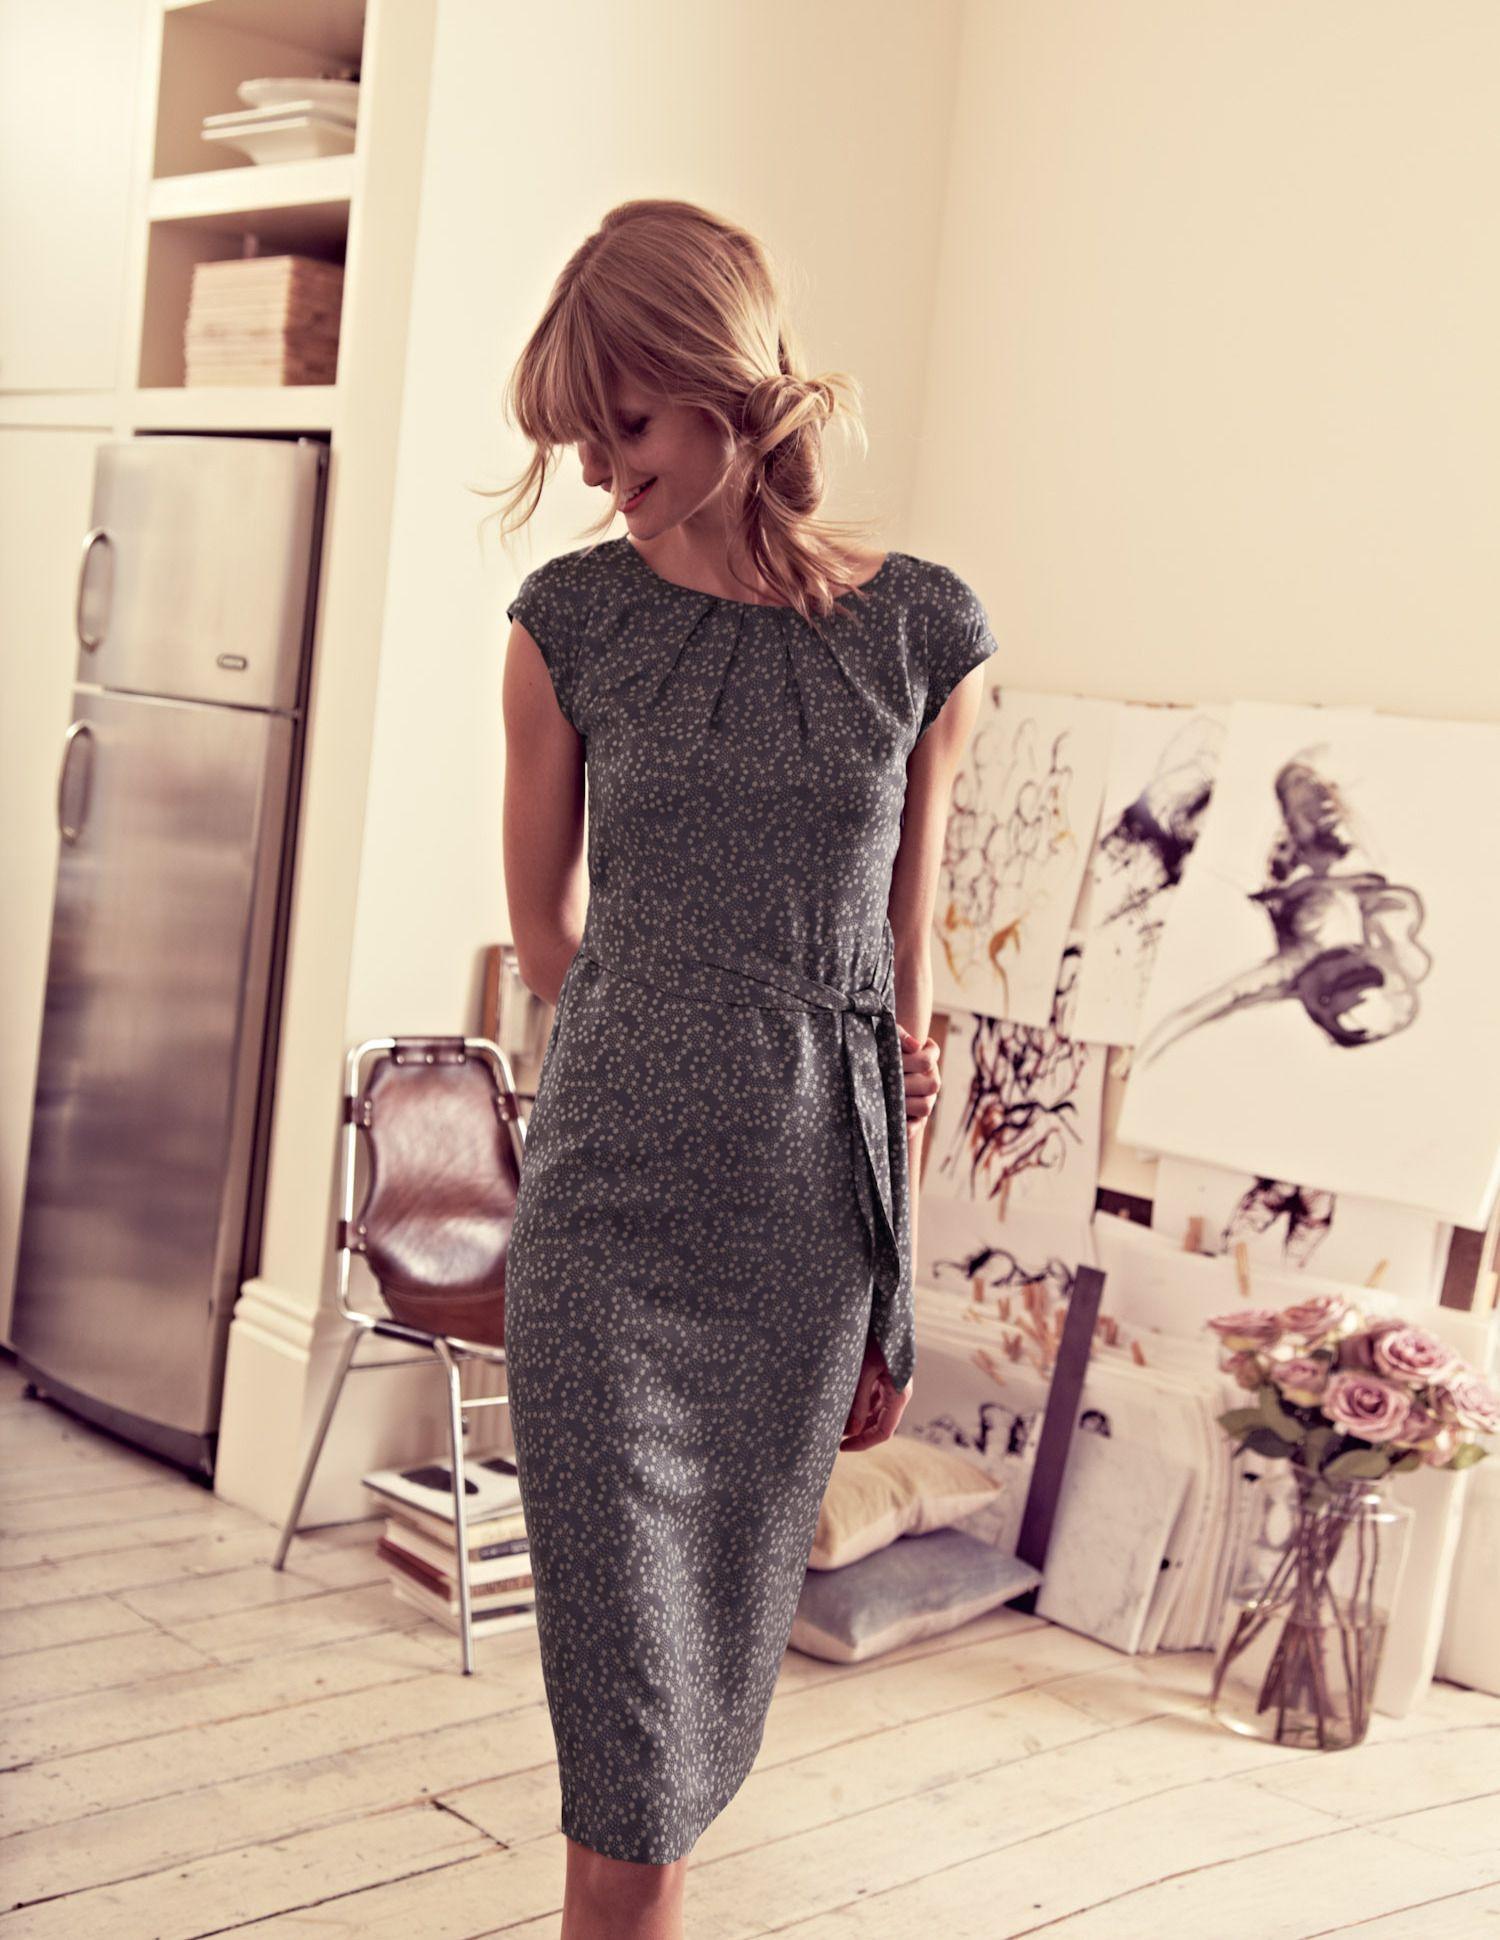 Natalie dress fasion pinterest for Bodendirect code